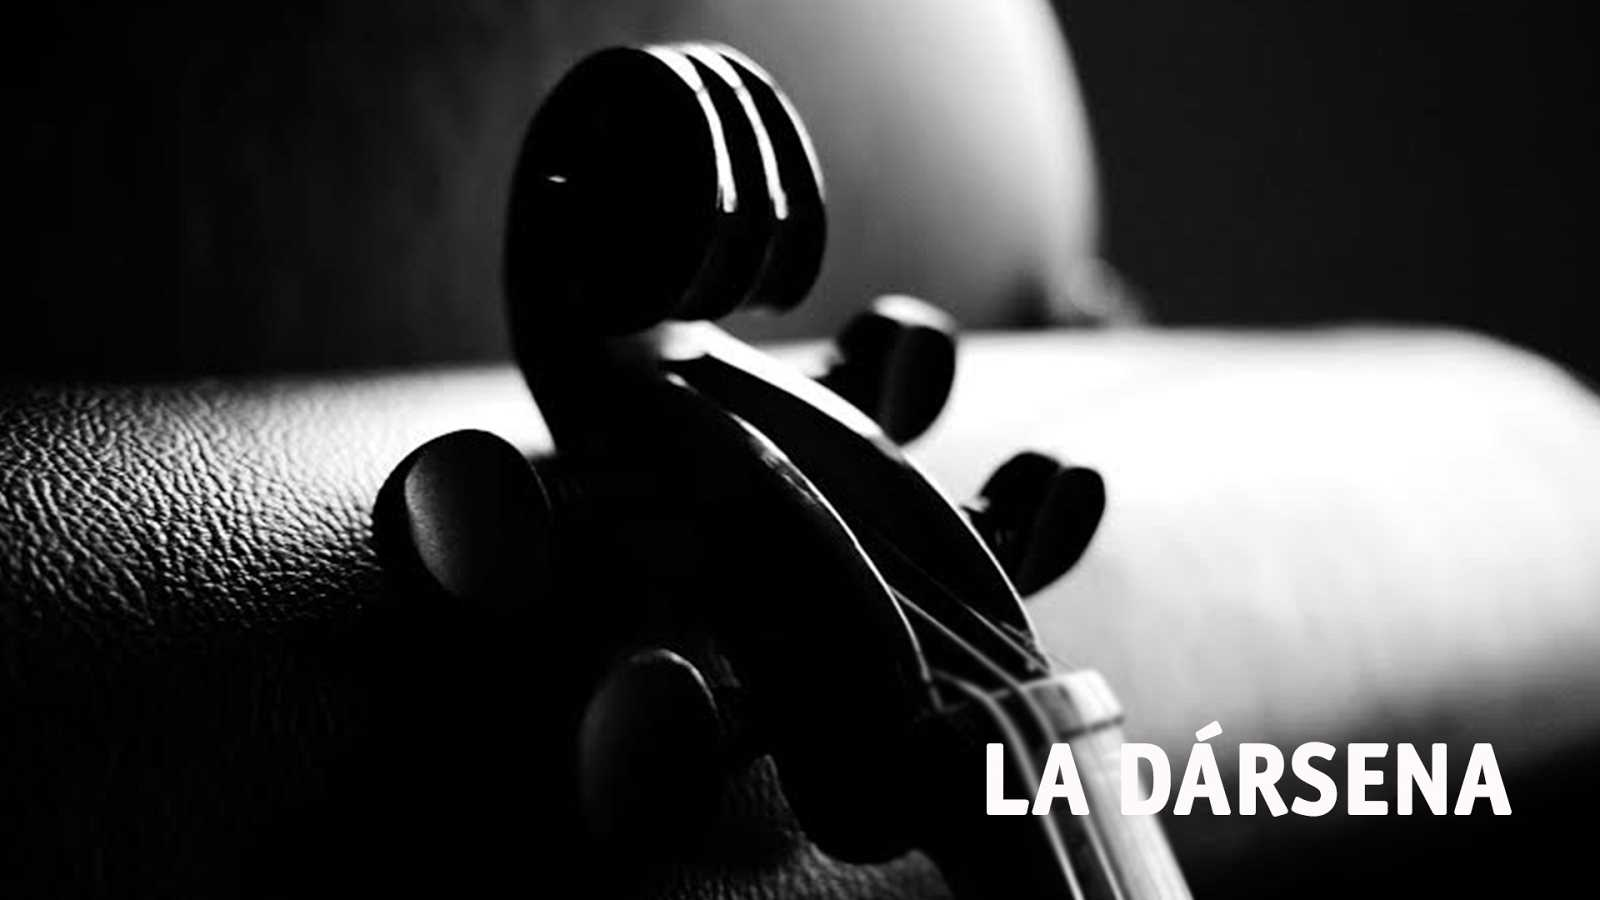 La dársena - Ariel Abramovich - 04/02/18 - escuchar ahora